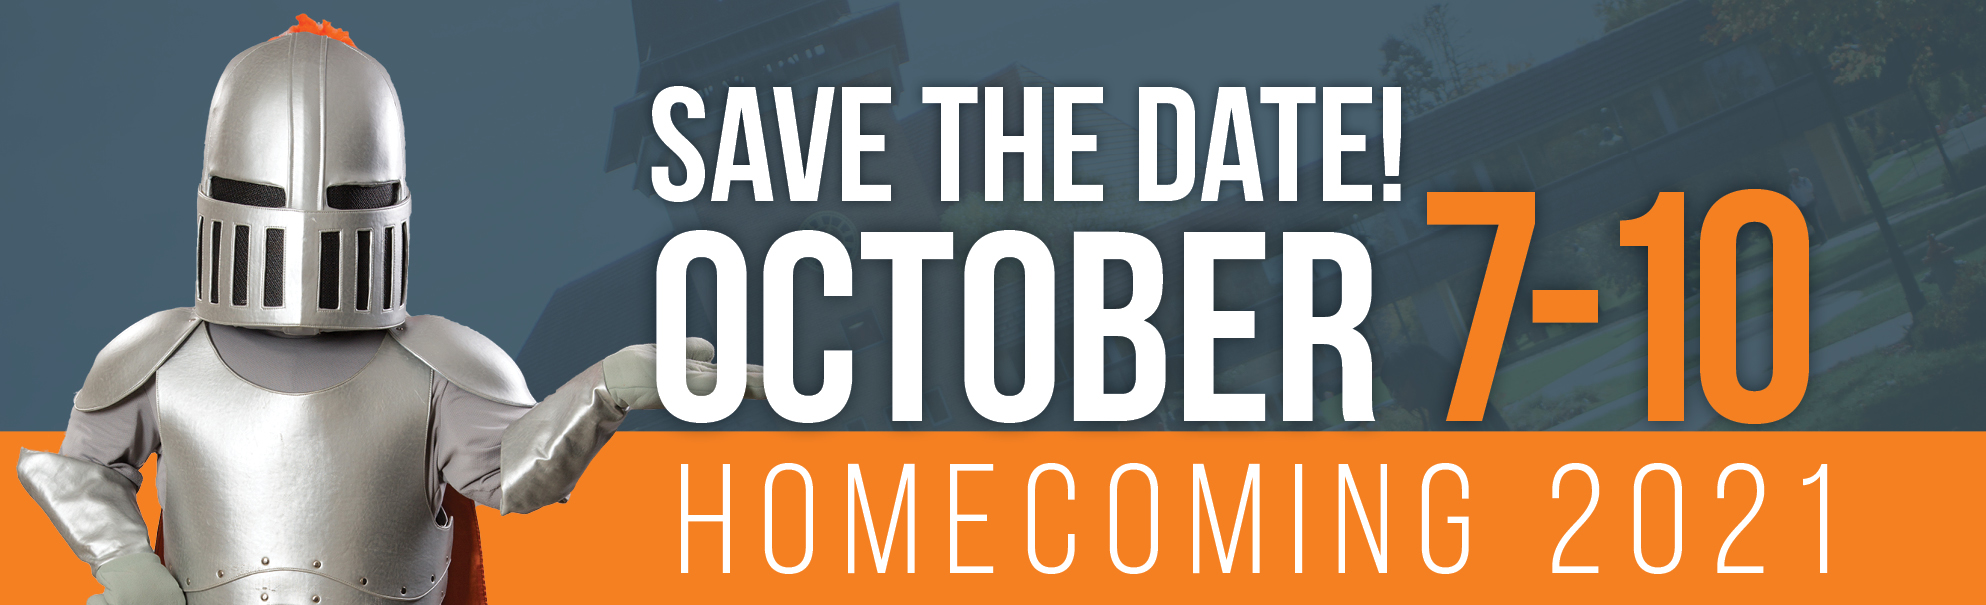 Homecoming 2021: Oct. 7-10